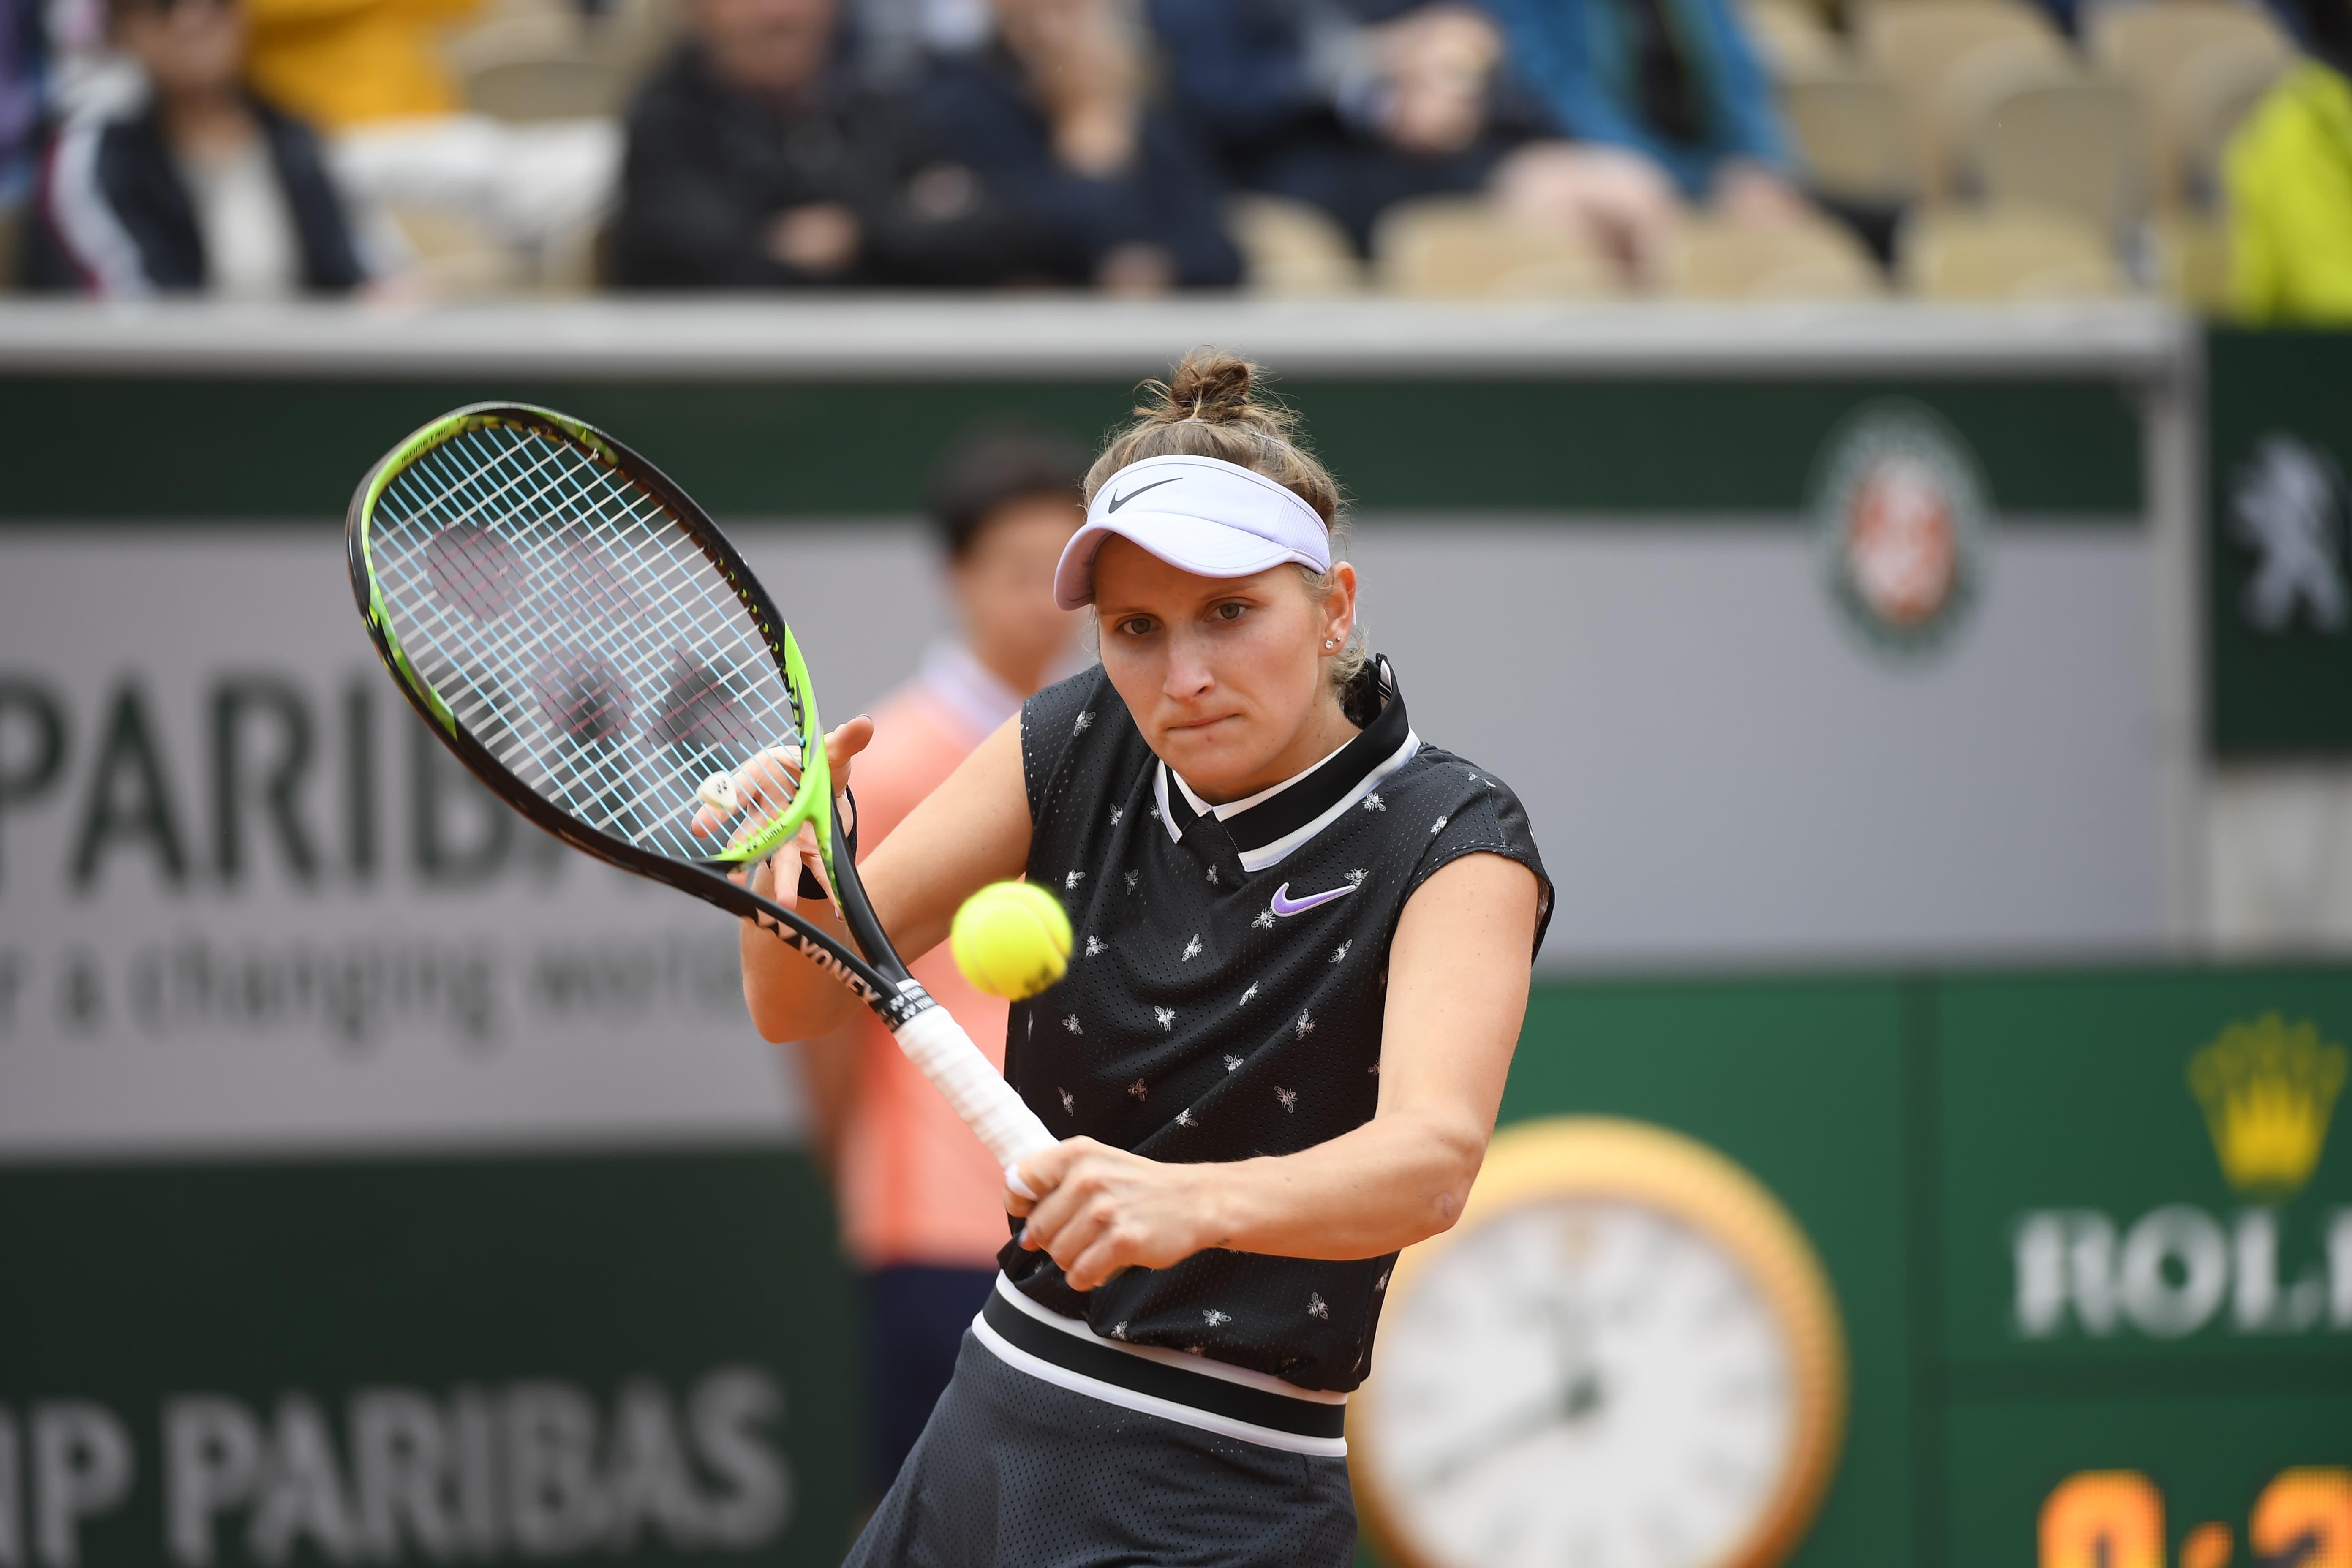 Market Vondrousova - Roland-Garros 2019 - demi-finale